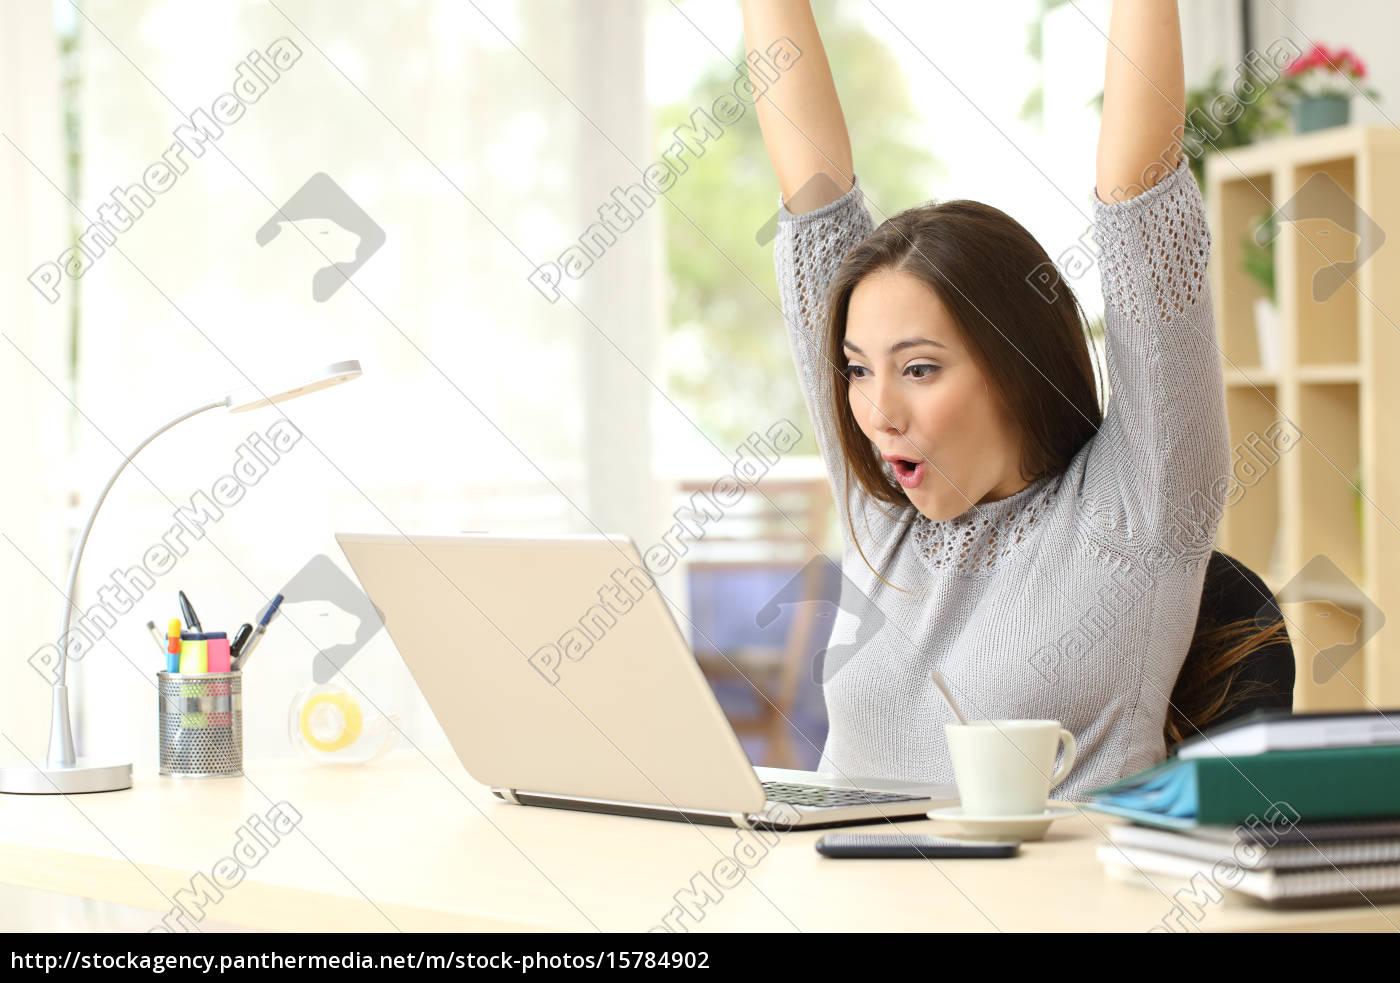 euphoric, and, surprised, winner, winning, online - 15784902